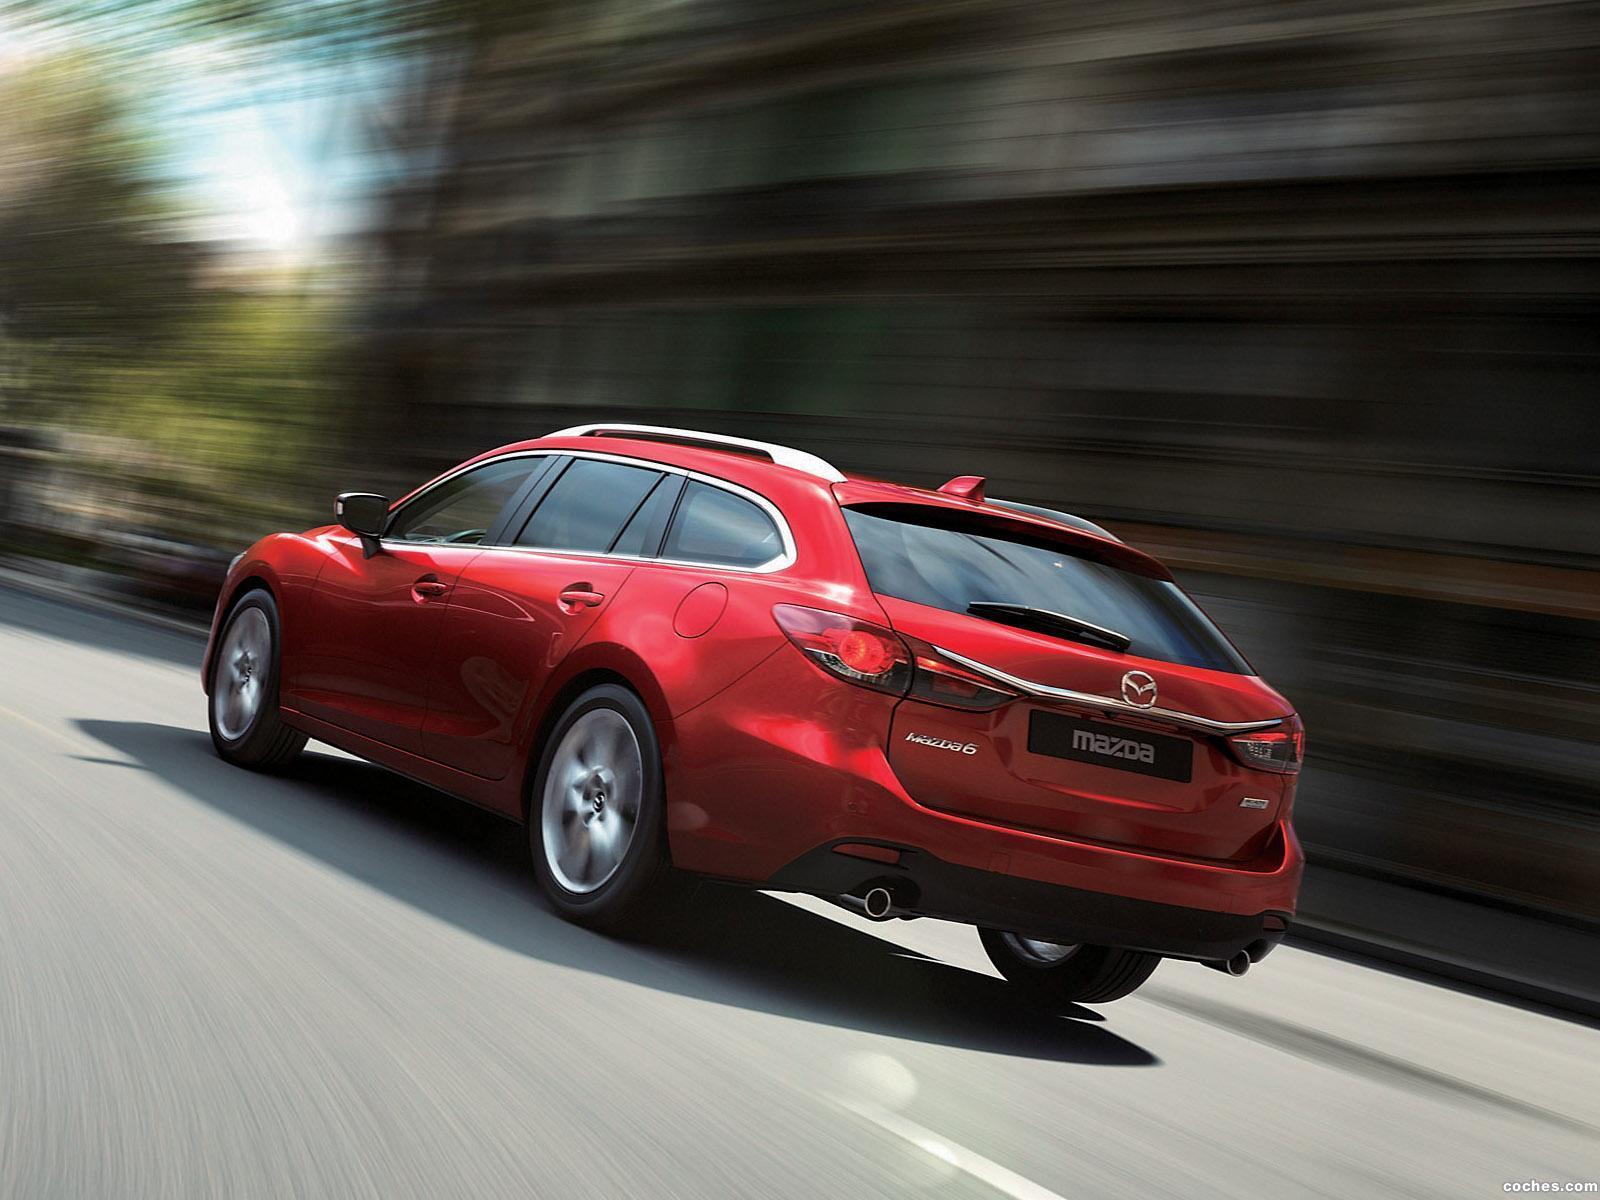 Foto 2 de Mazda 6 Wagon 2013